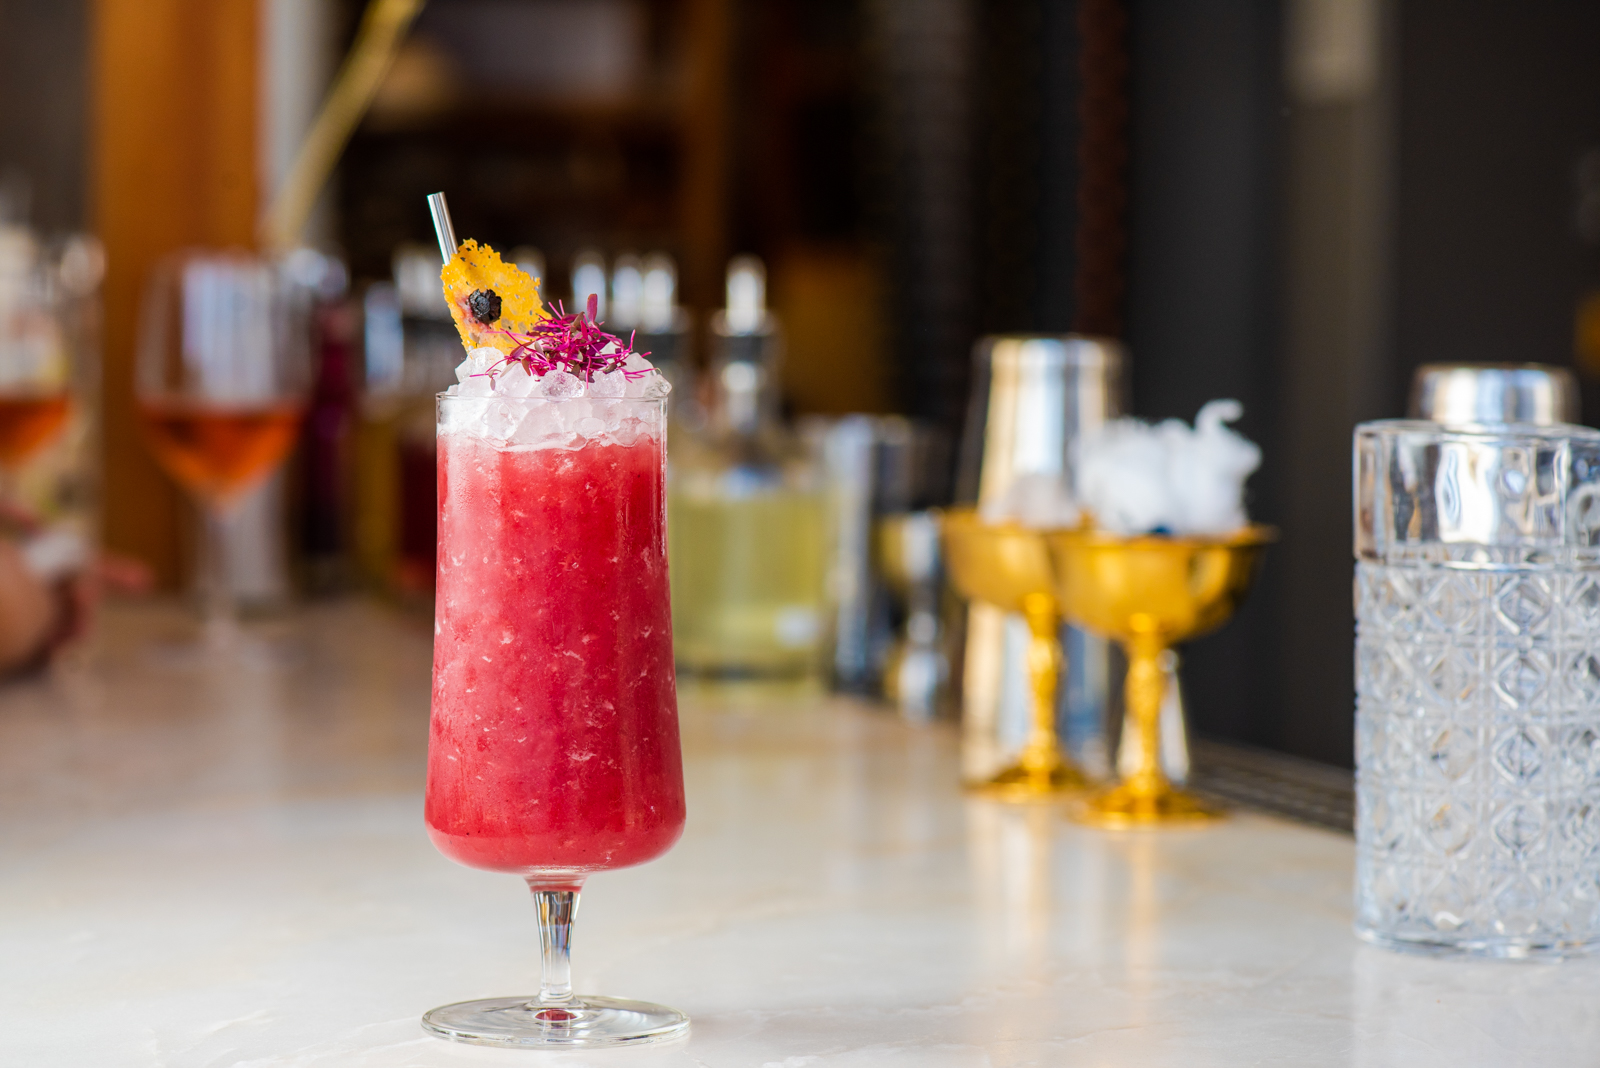 An LA Bar Star Launches Tartineu0027s First